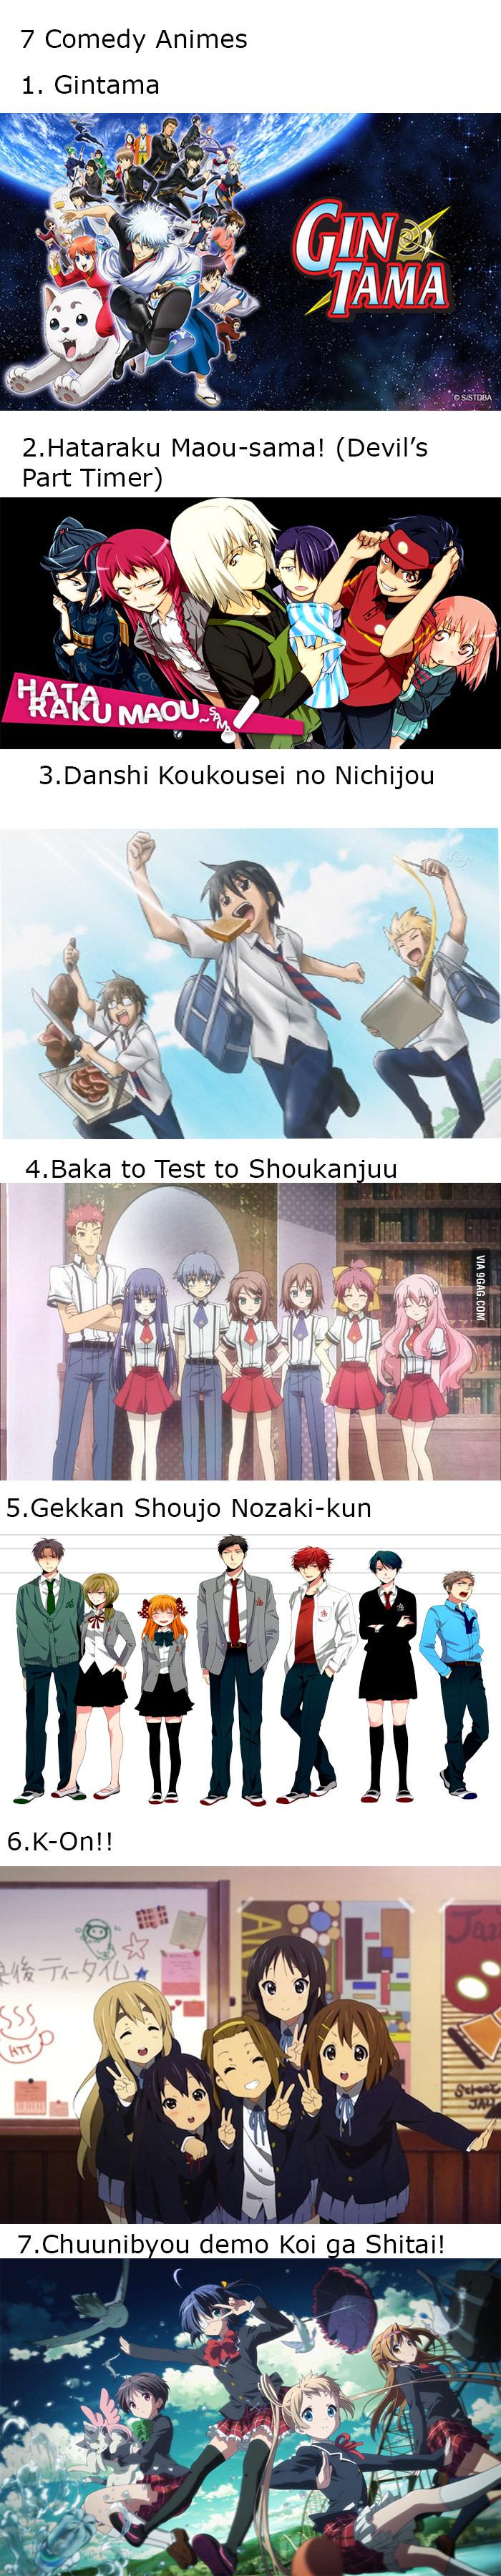 7 Comedy Animes Anime Anime films